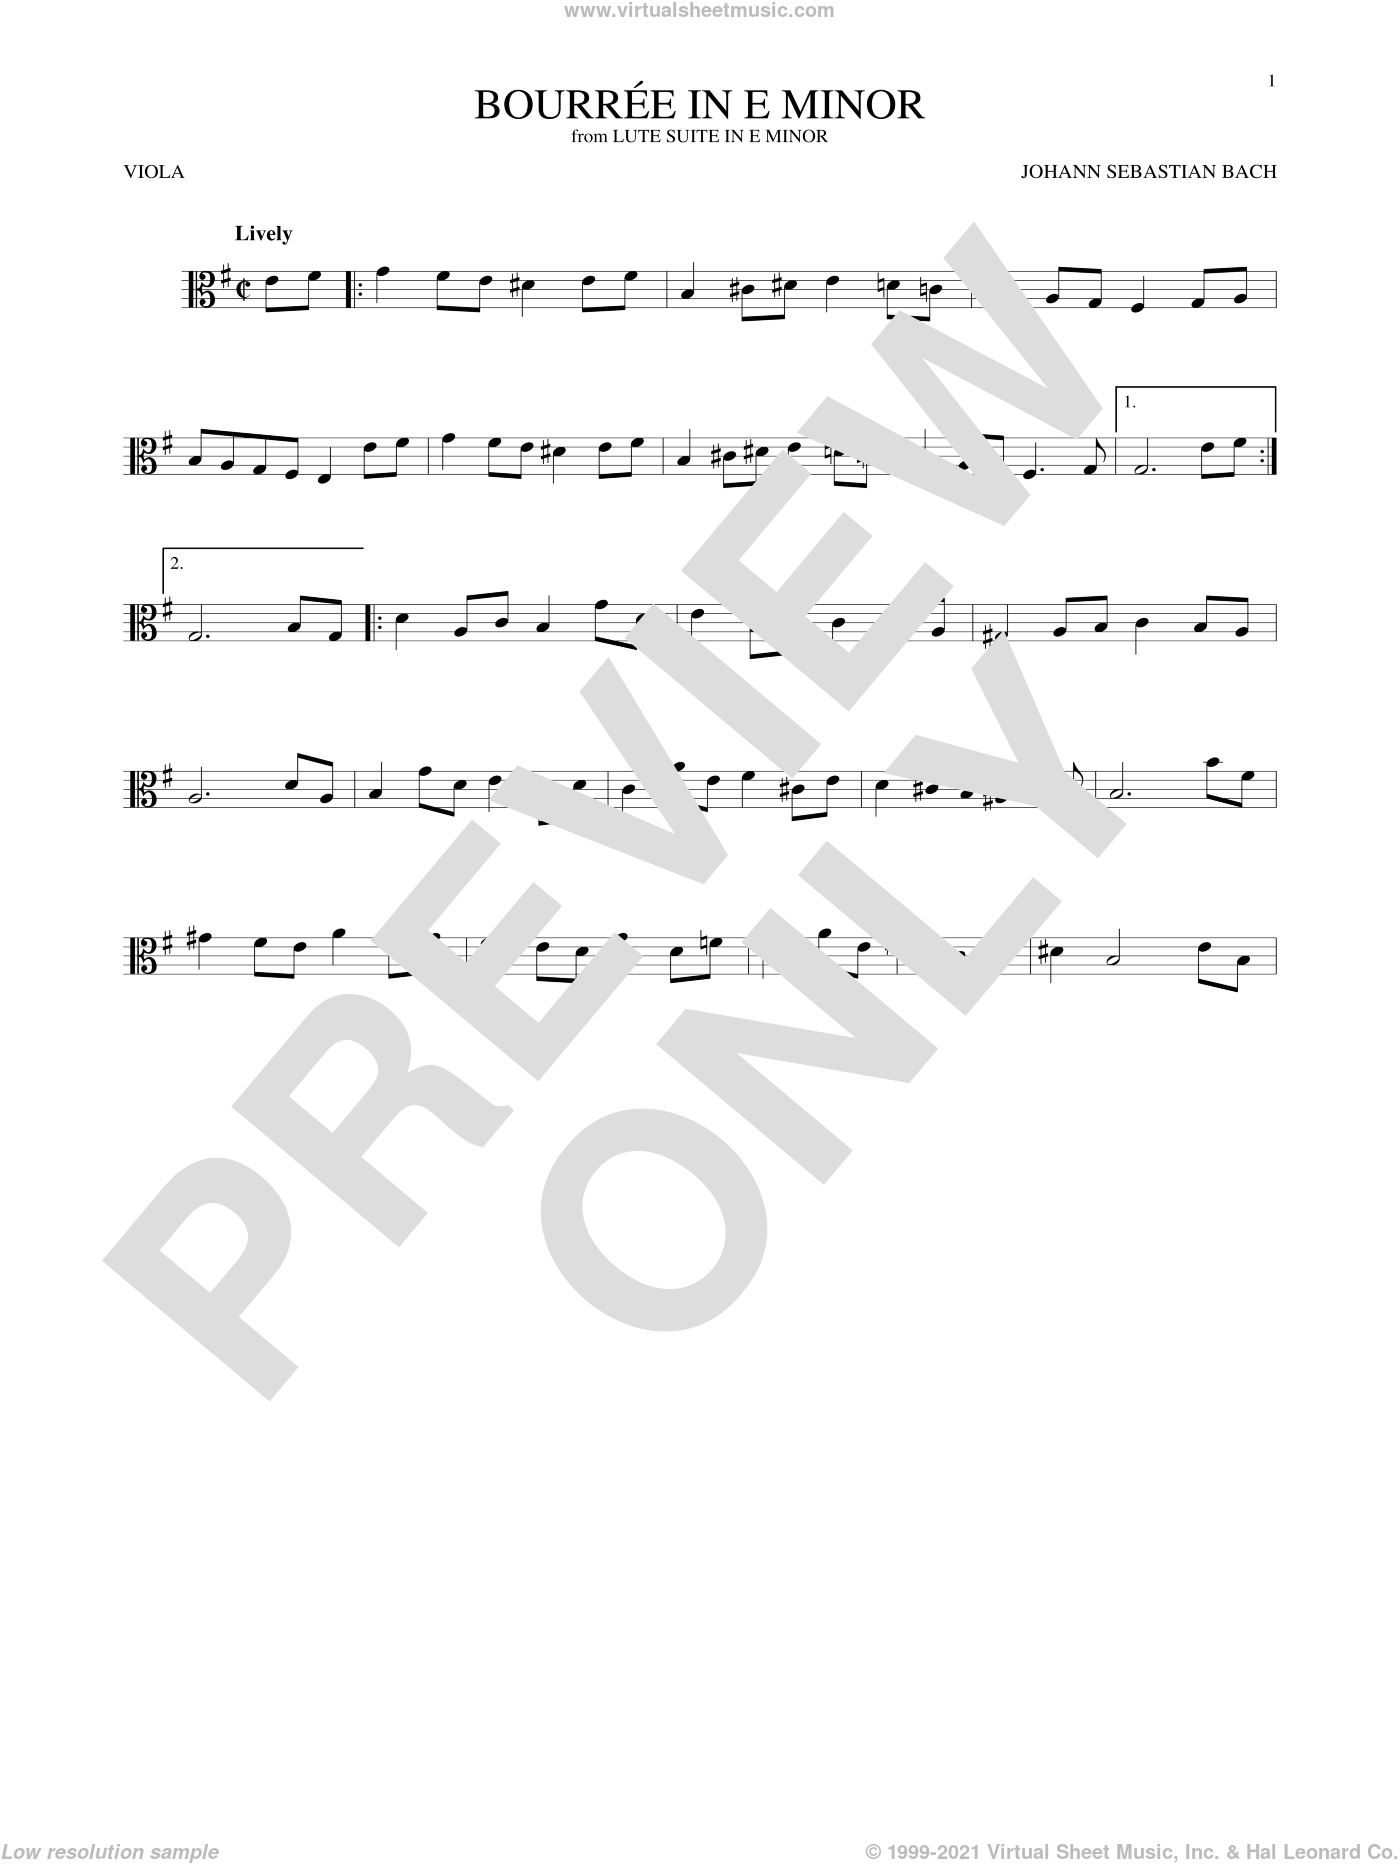 Bourree In E Minor sheet music for viola solo by Johann Sebastian Bach, classical score, intermediate skill level